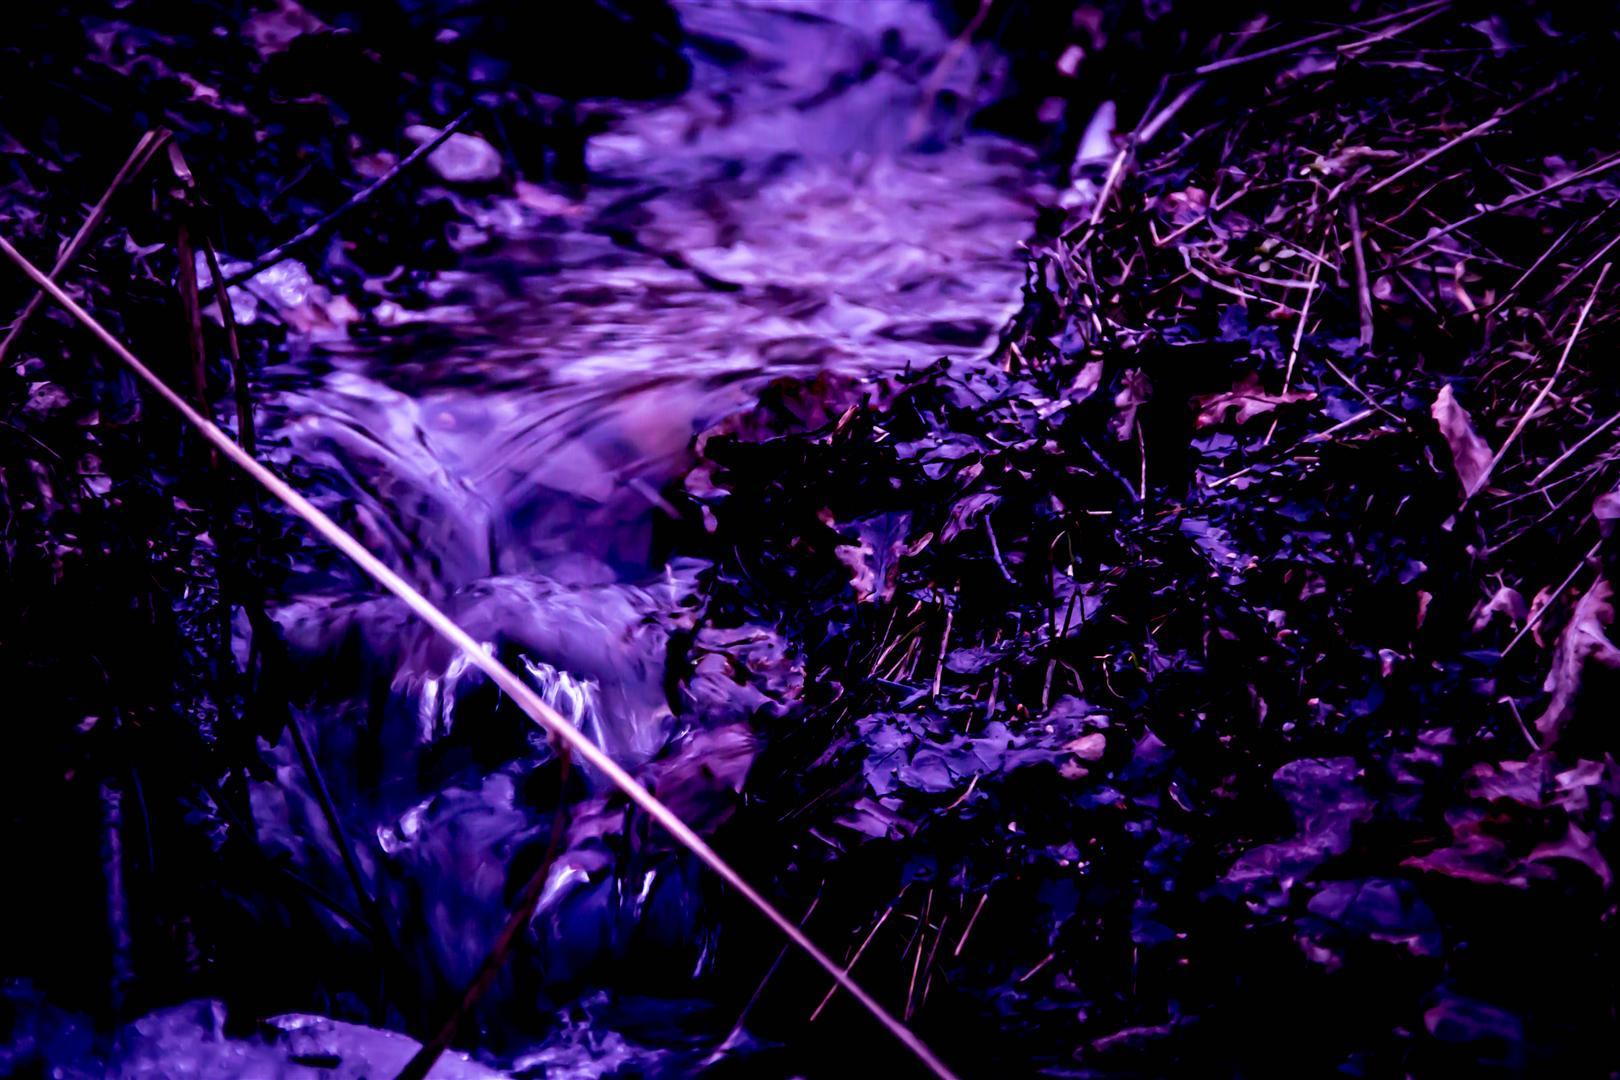 Appelquist foto - Vatten4